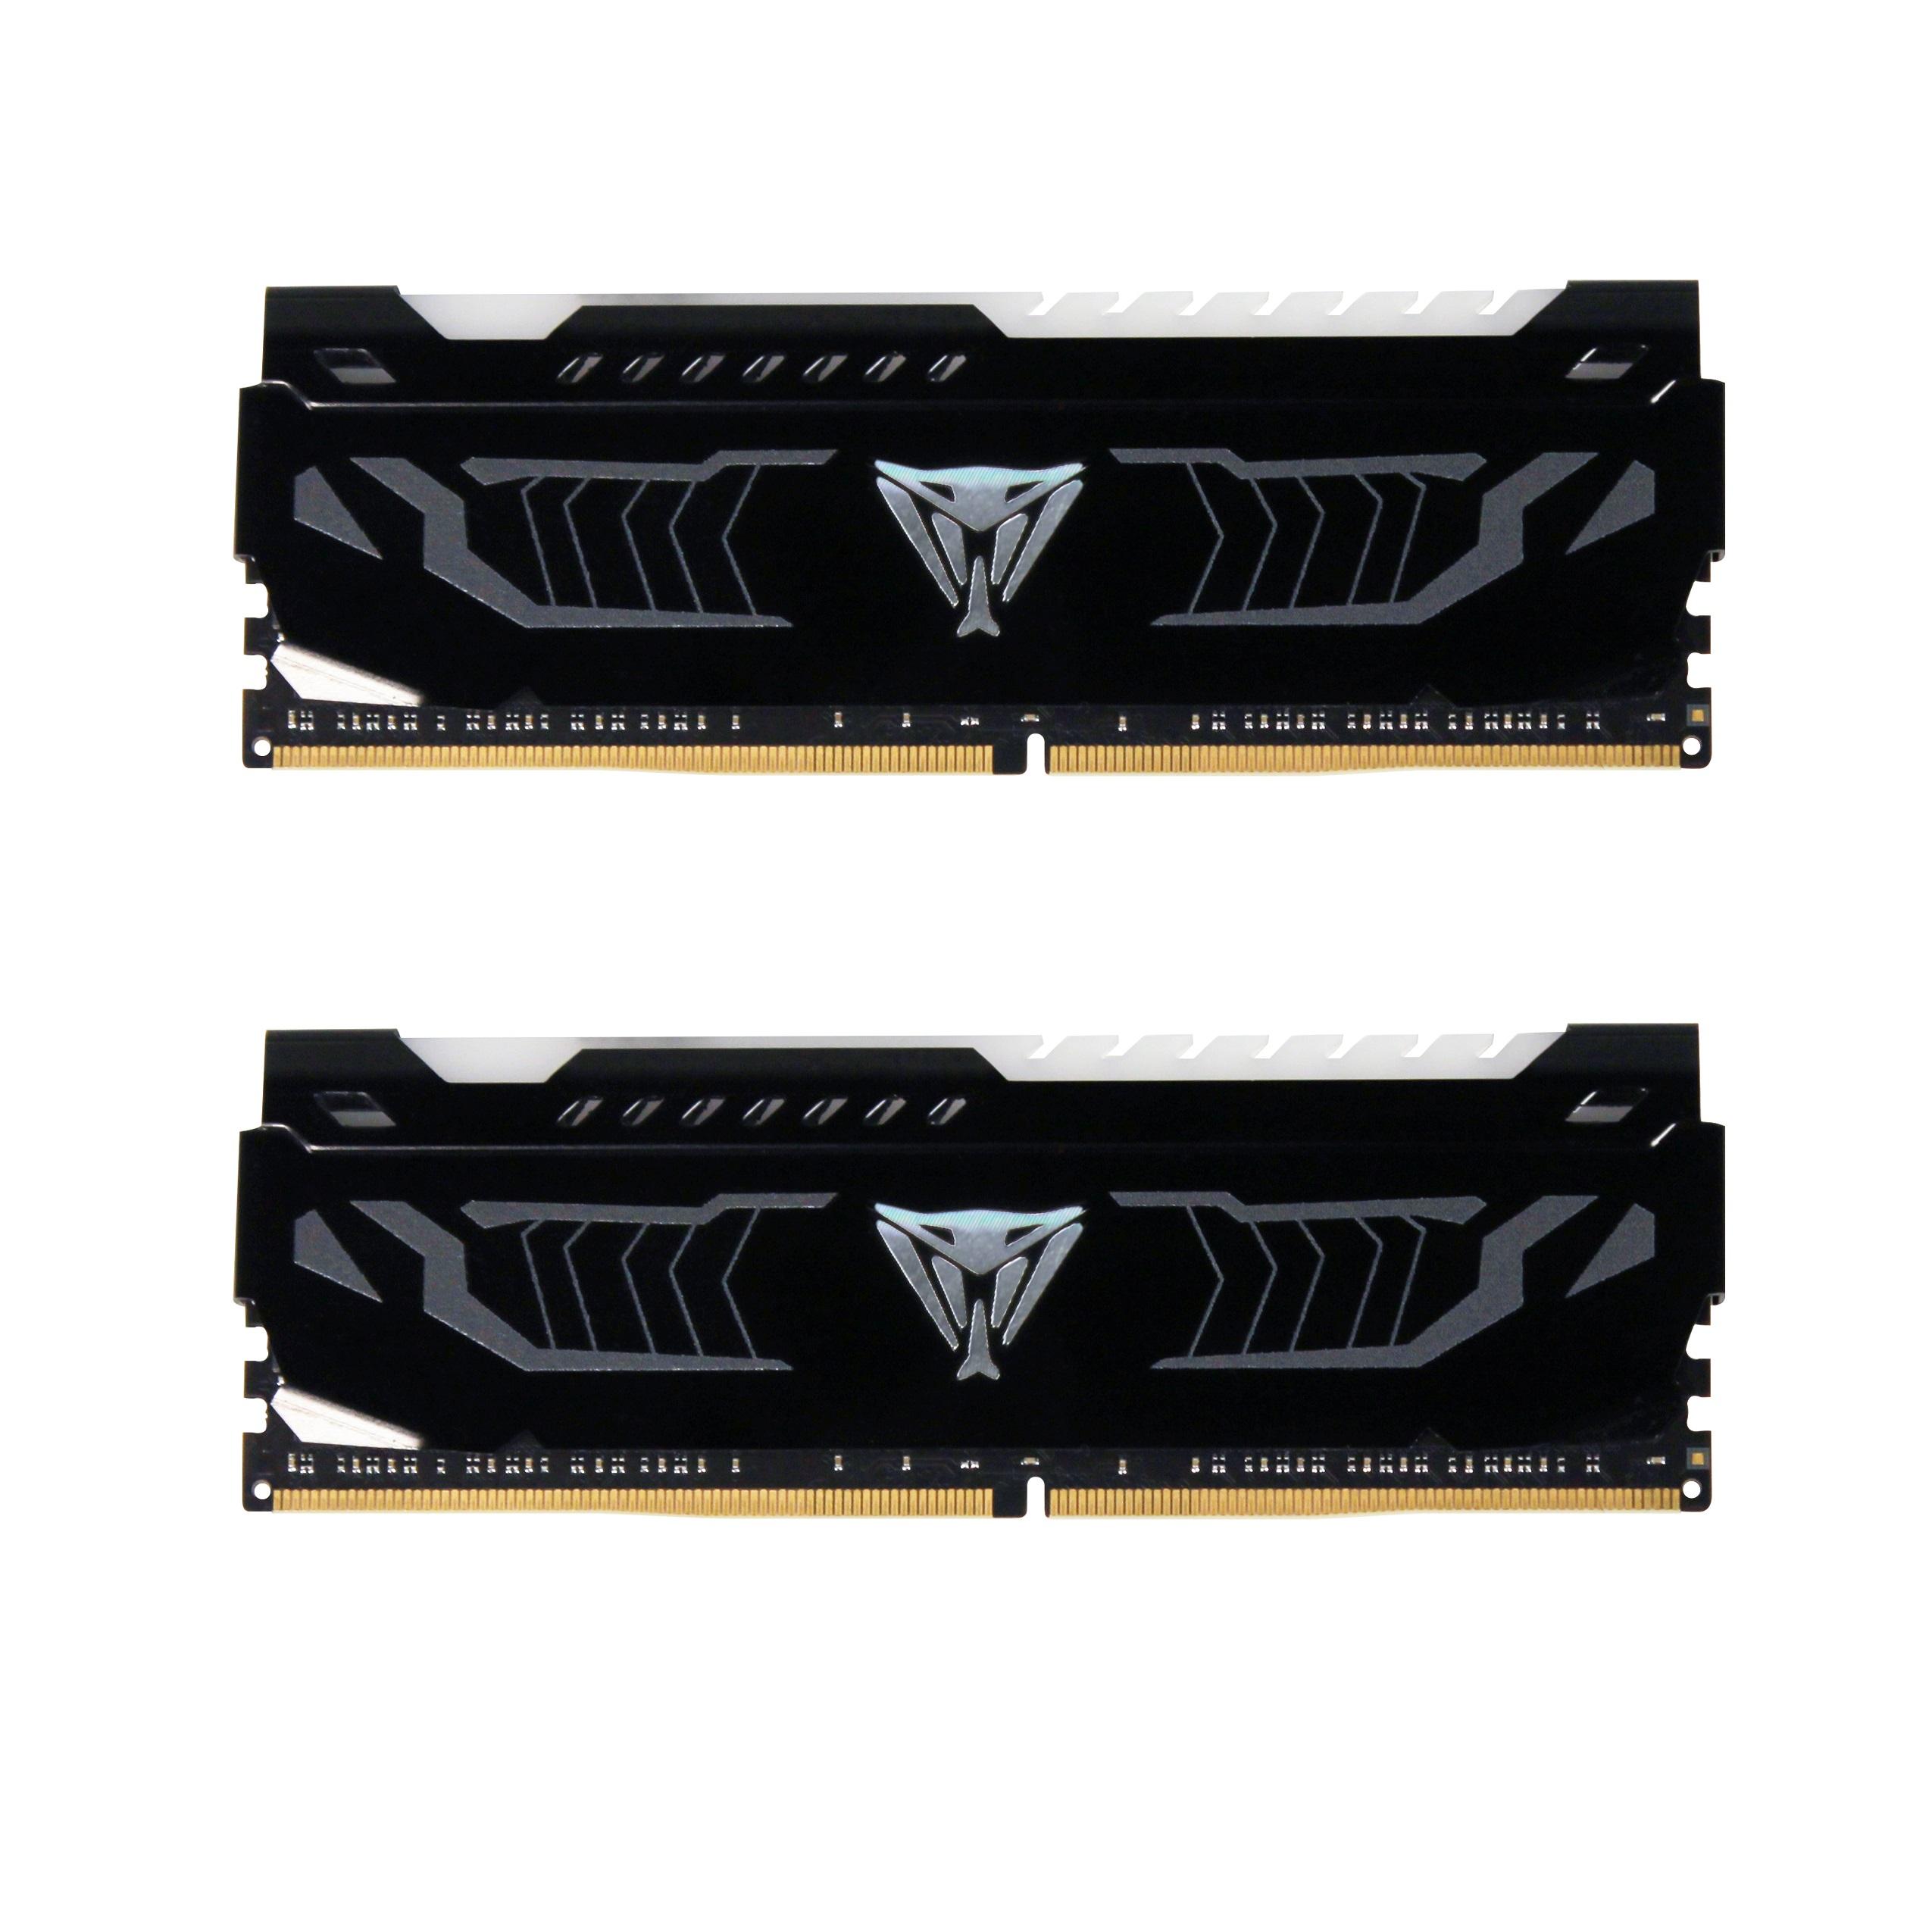 16GB DDR4-2666MHz Patriot Viper CL15, 2x8GB. červené LED